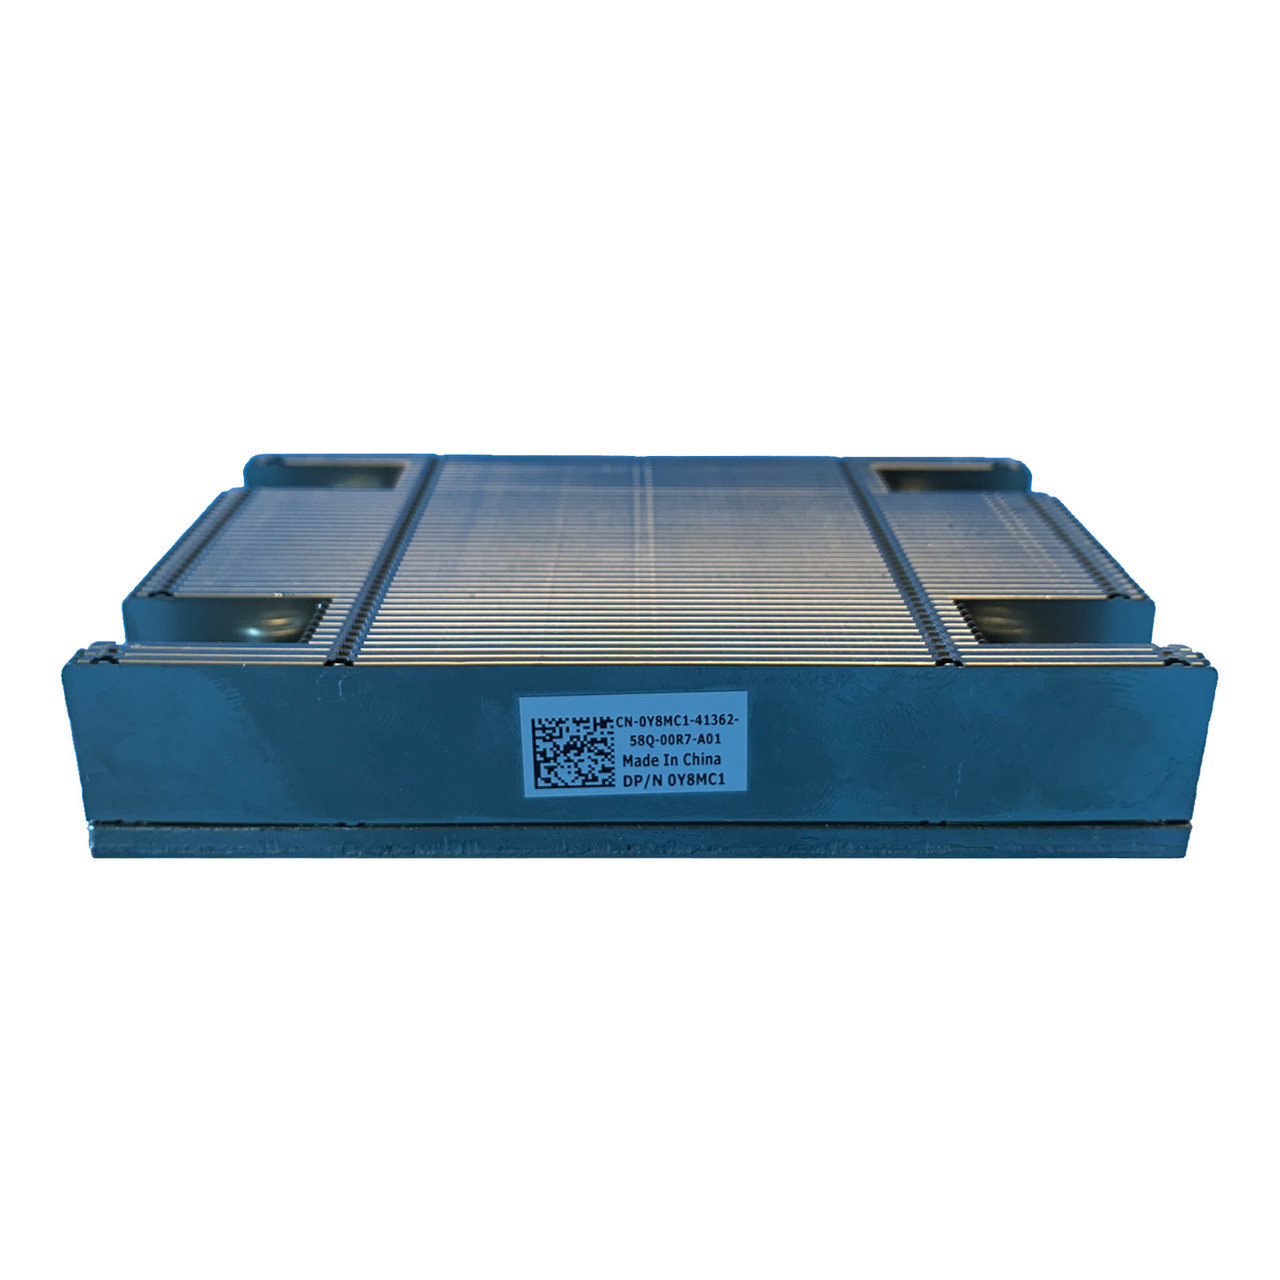 Dell CPU Heatsink For PowerEdge R630 Y8MC1